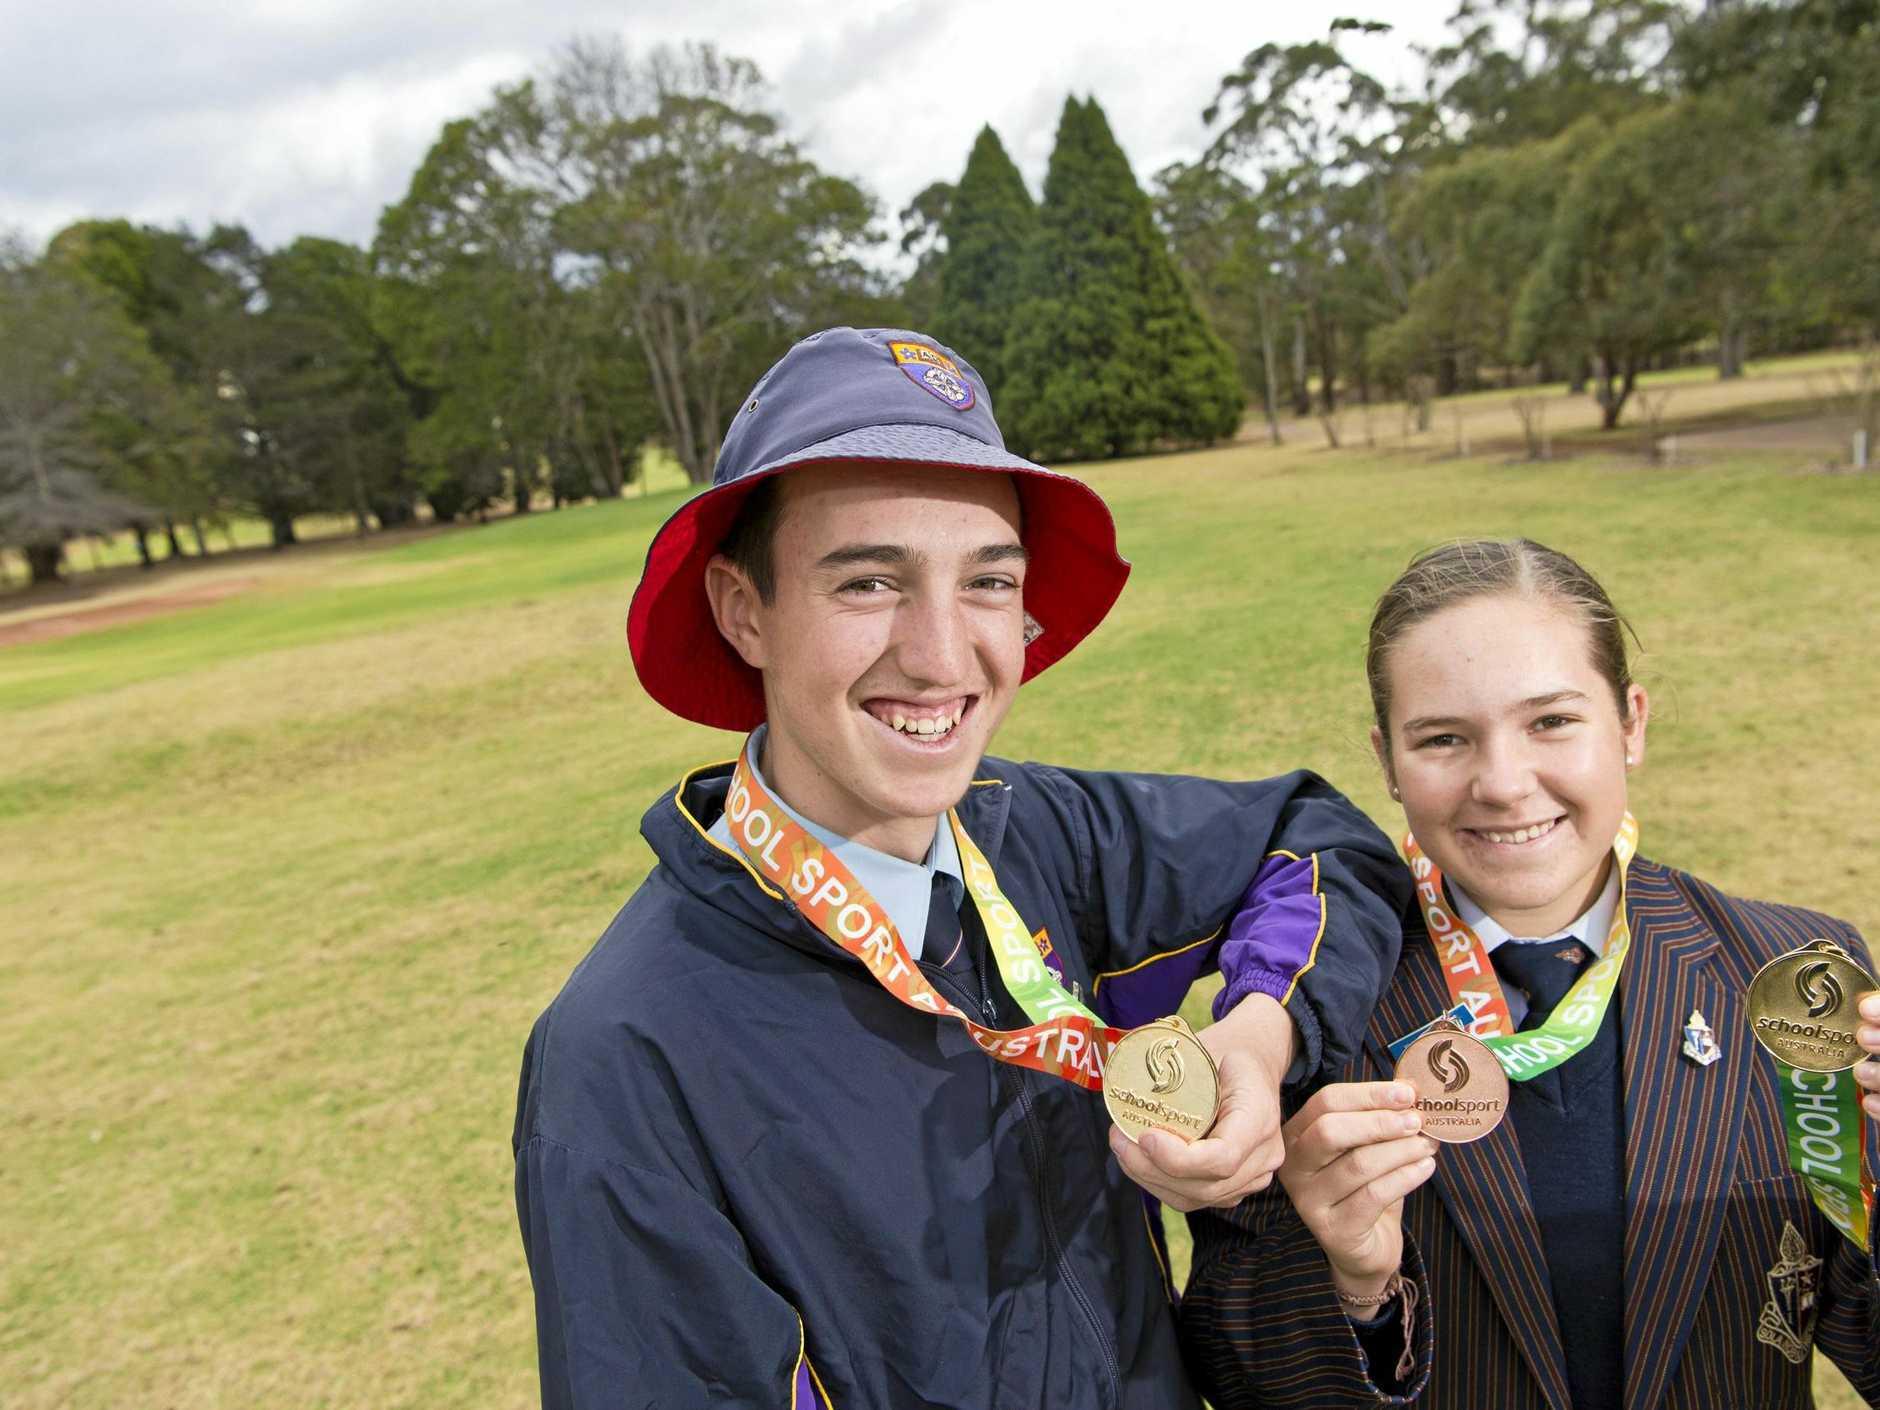 Toowoomba junior golfers Quinn Croker and Kamryn Dunemann show their medals from the 2018 School Sport Australia under-17 golf championships, Thursday, September 6, 2018.